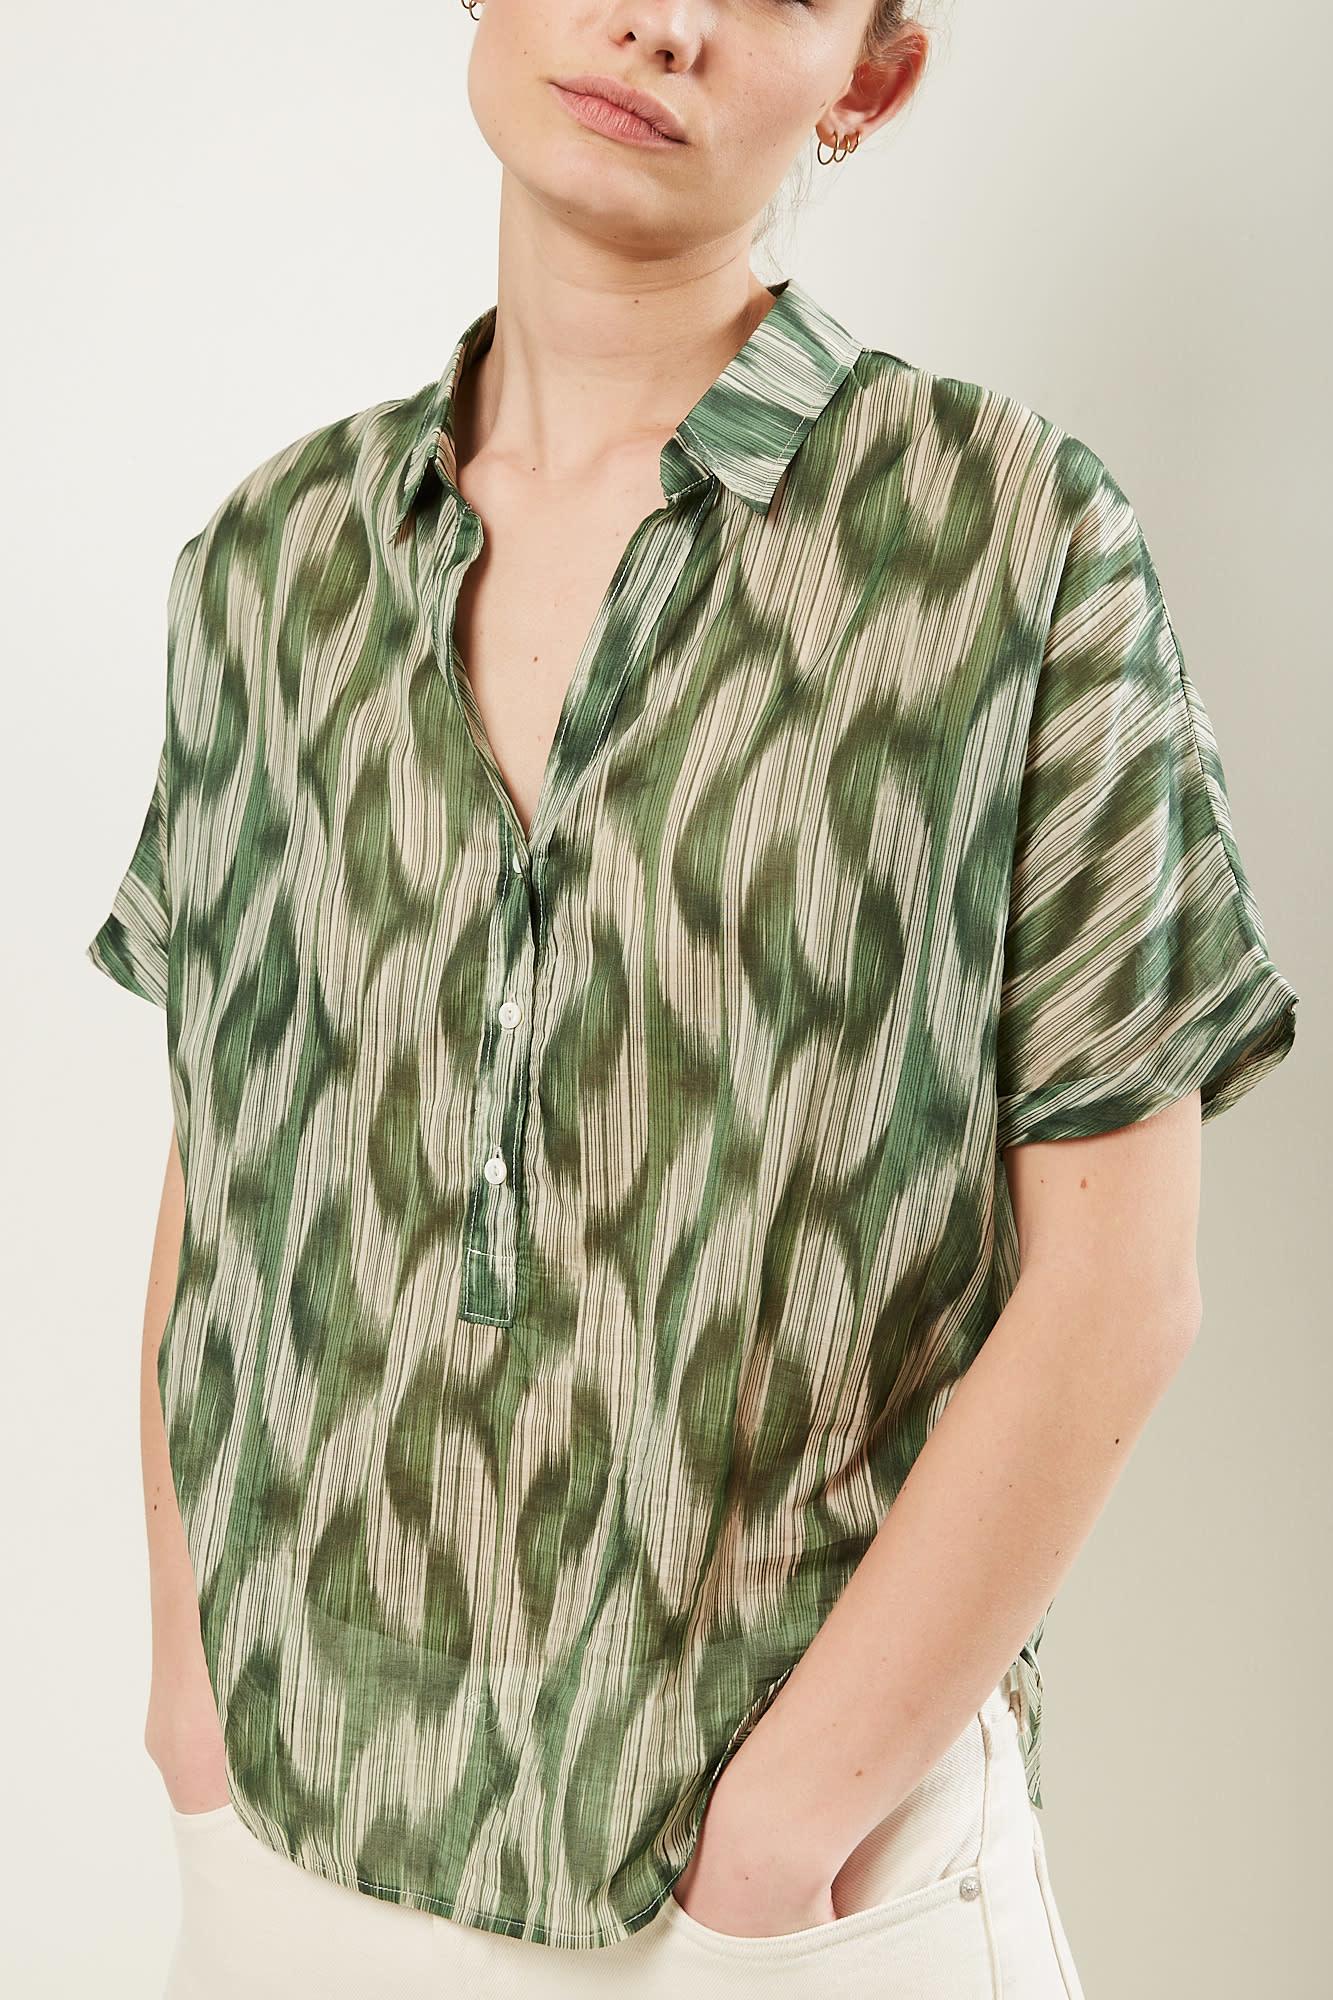 Diega Colomba shirt